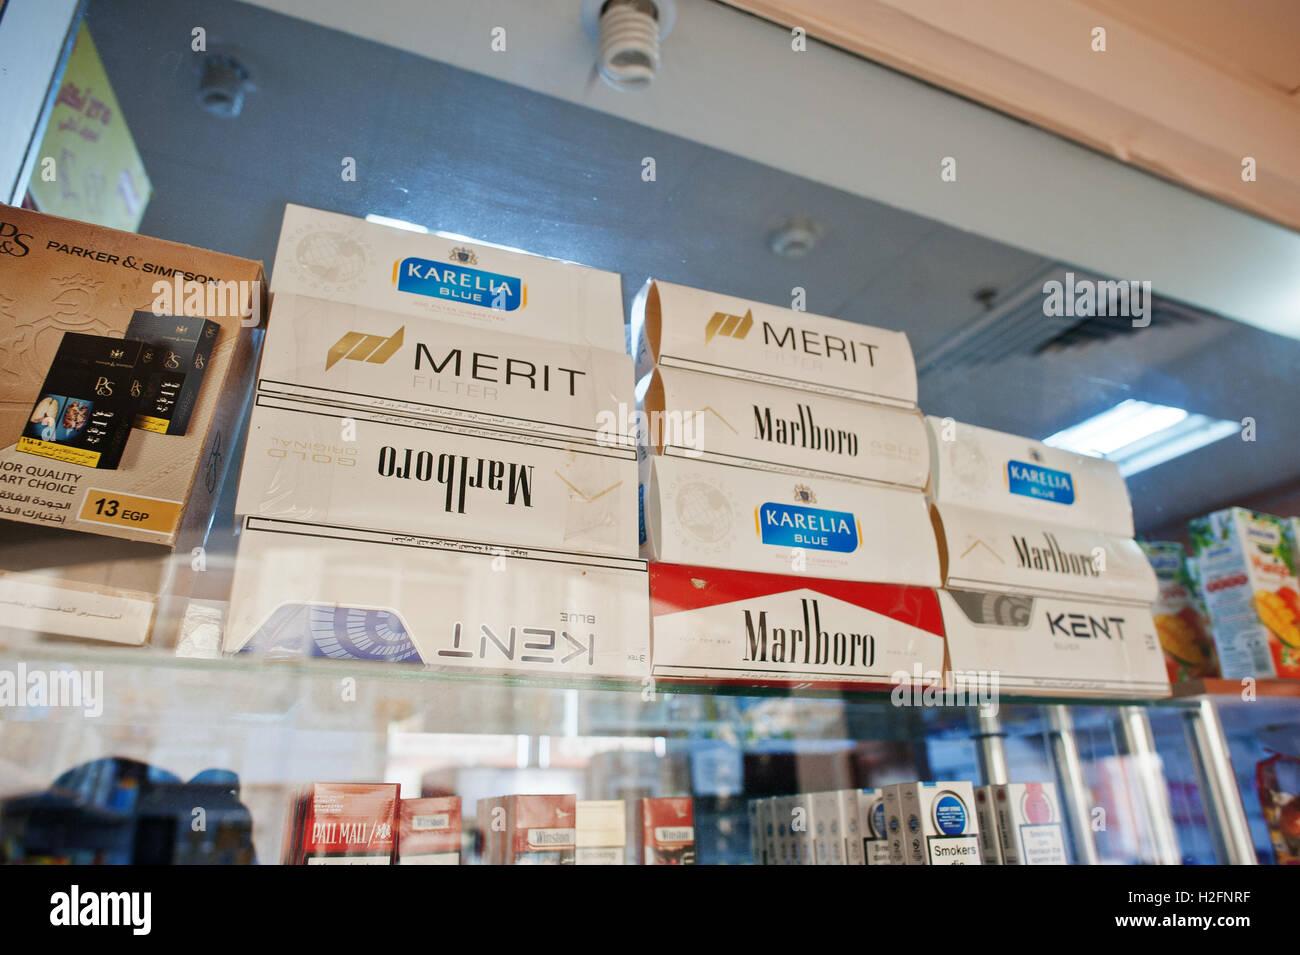 How much do cigarettes Marlboro cost in Minnesota